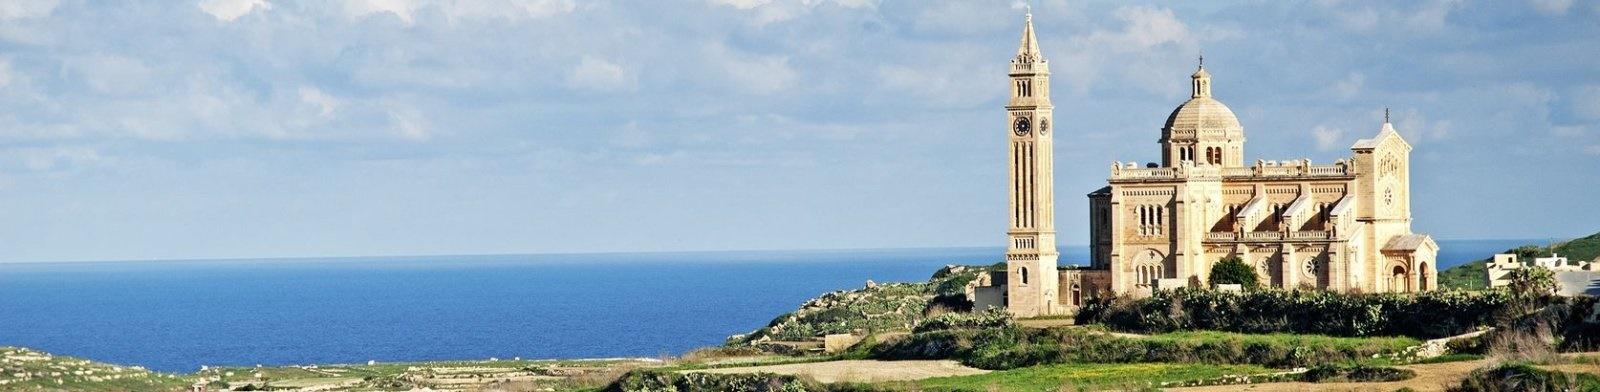 Gozo, main image